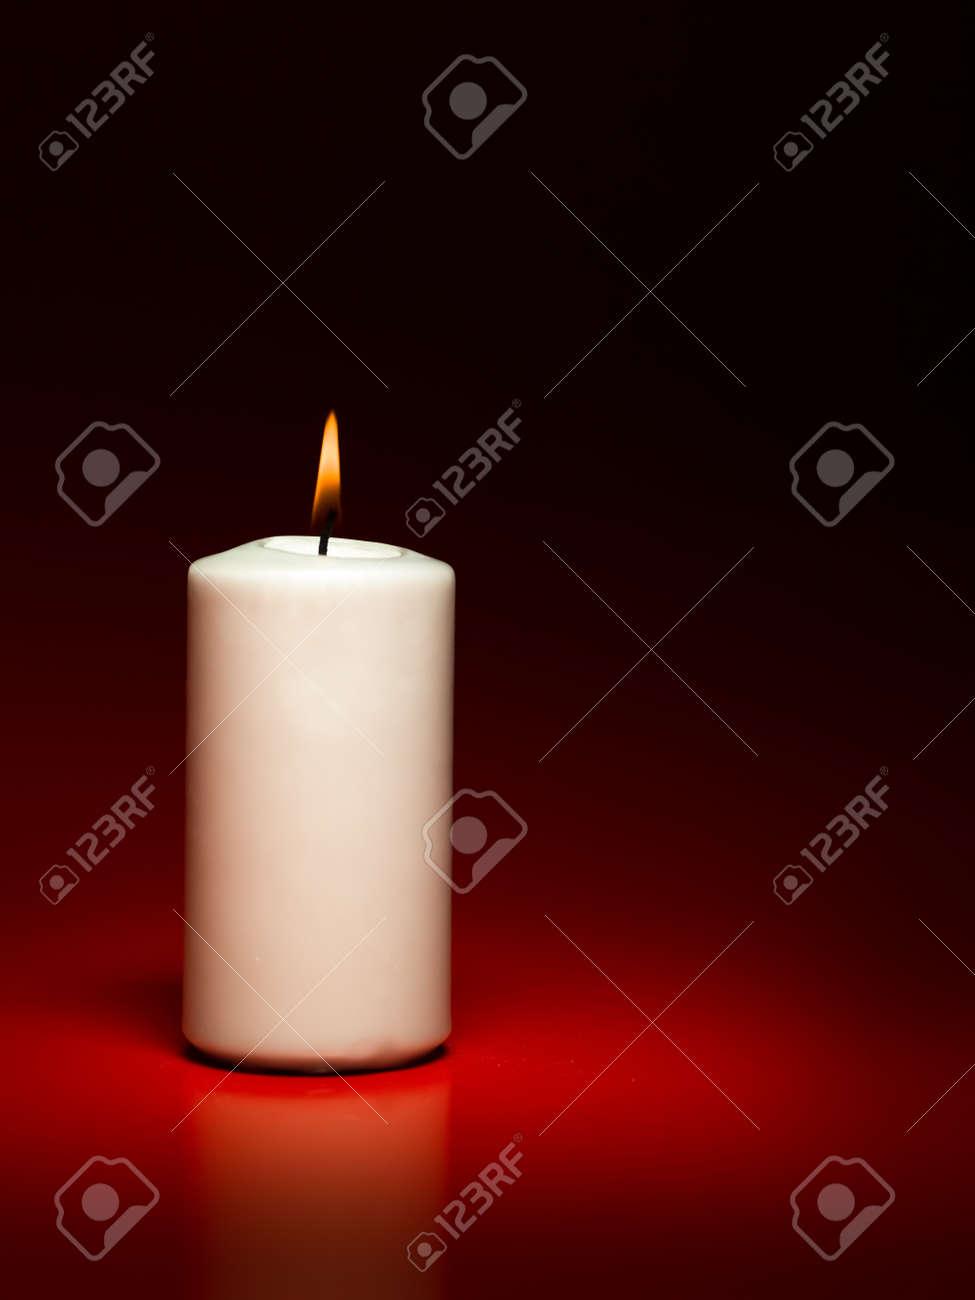 closeup of single white burning candle on red background Stock Photo - 16775076